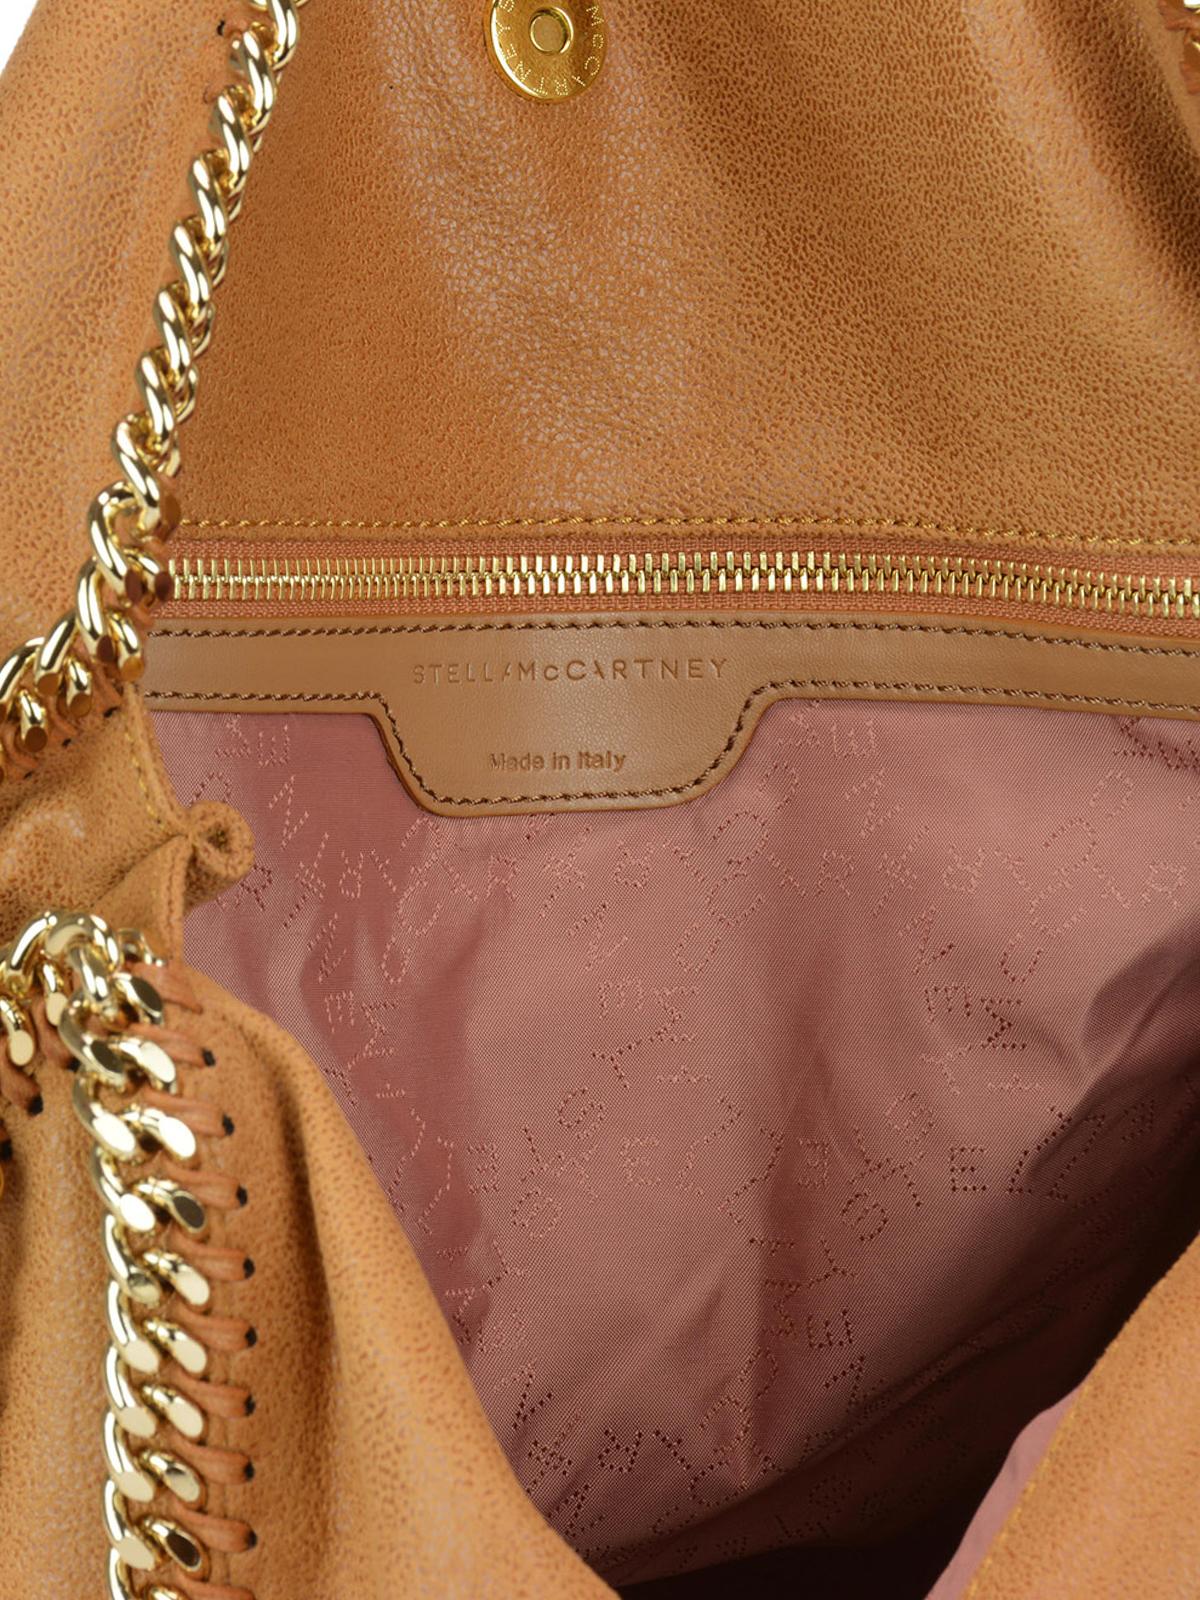 21f67329c4ae Stella Mccartney - Fold over Falabella tan tote - totes bags ...